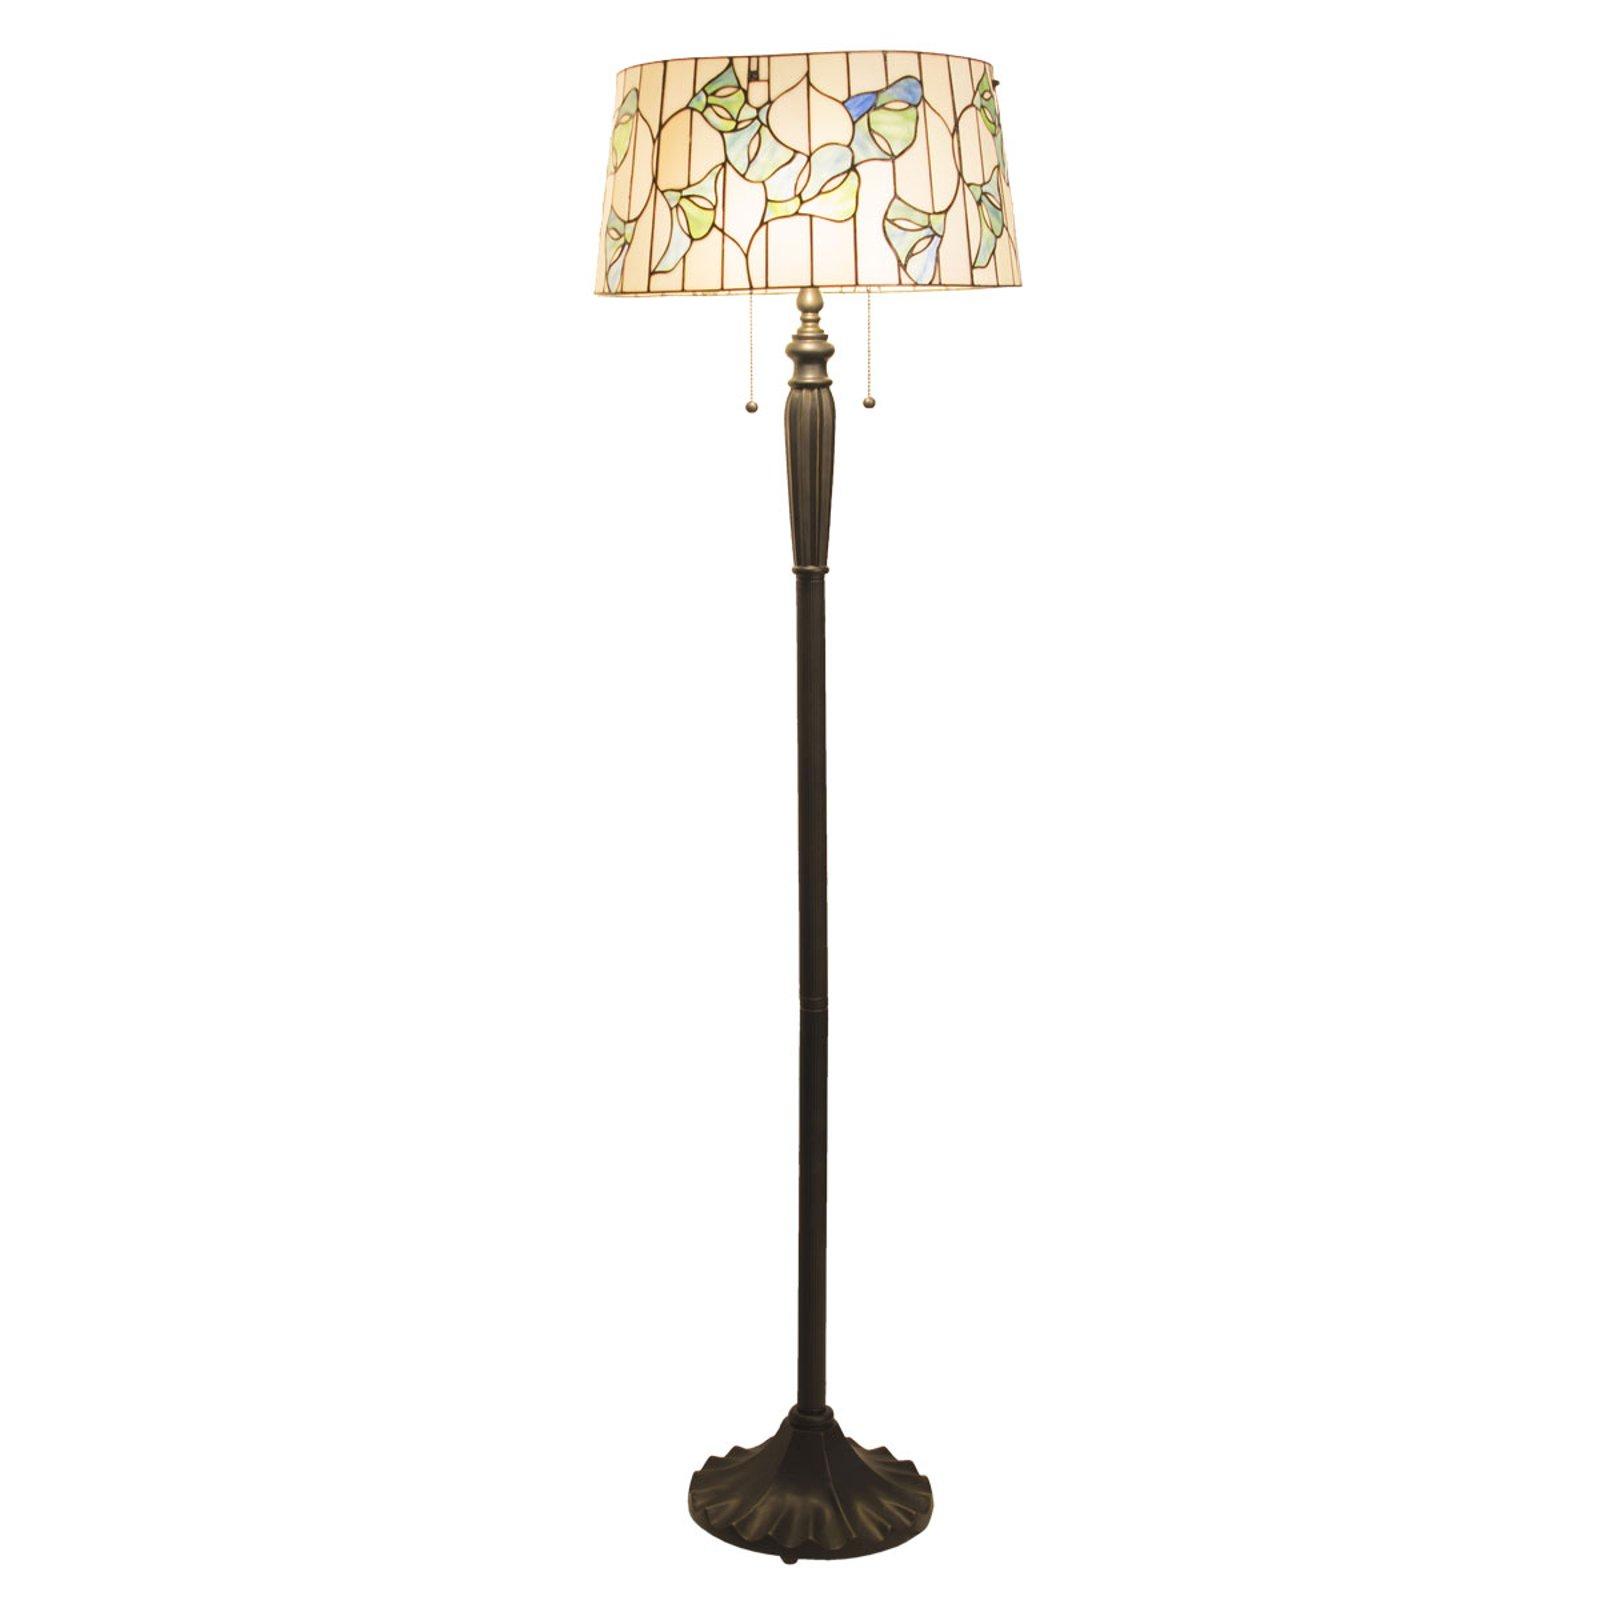 5944 gulvlampe med sylinderskjerm, Tiffany-stil